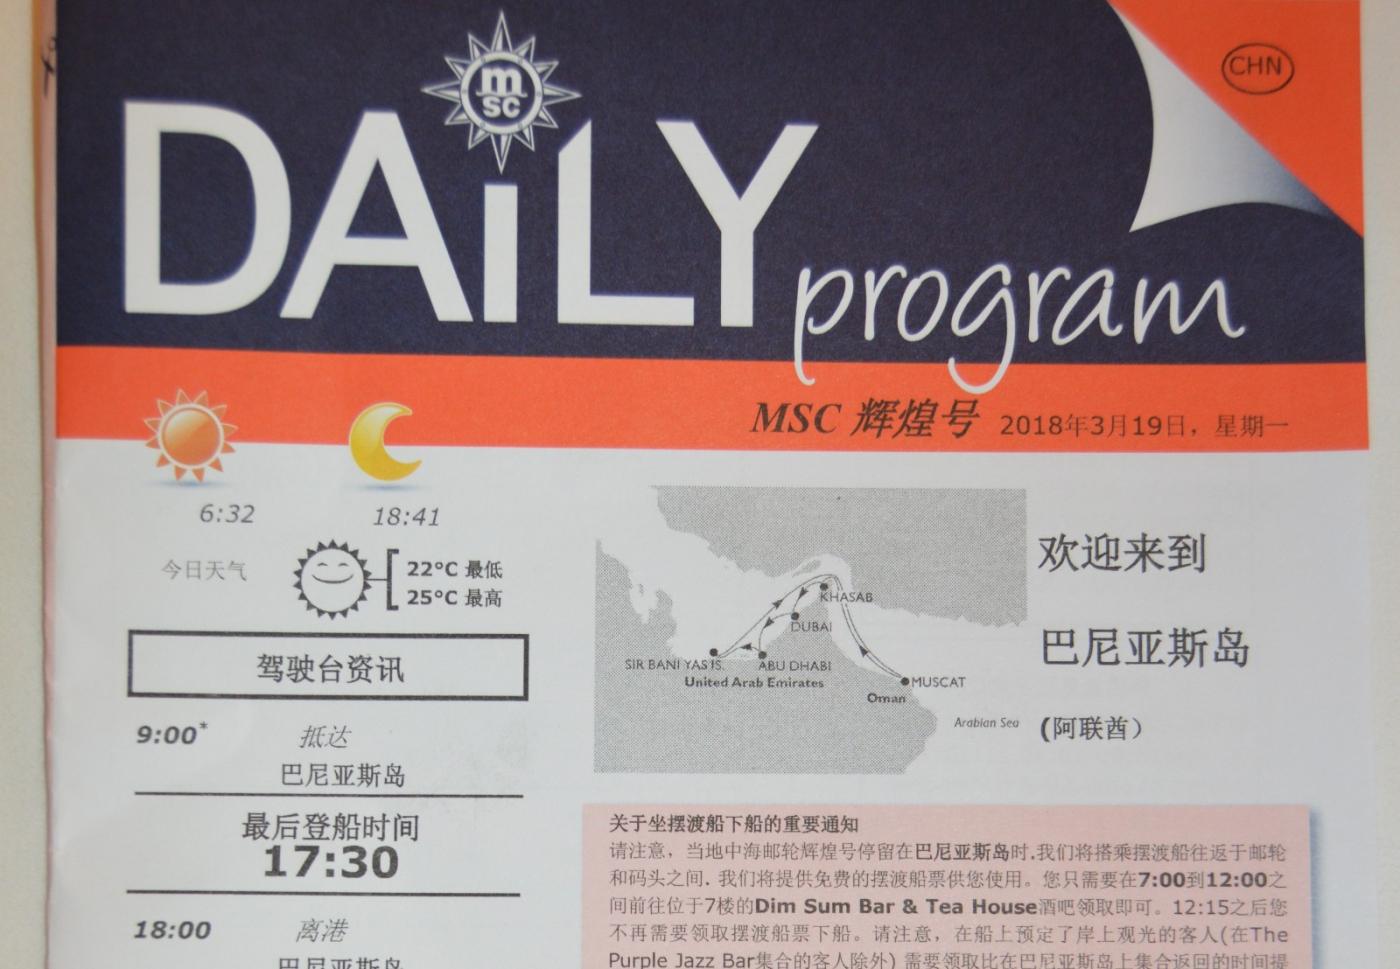 MSC辉煌号邮轮_图1-51